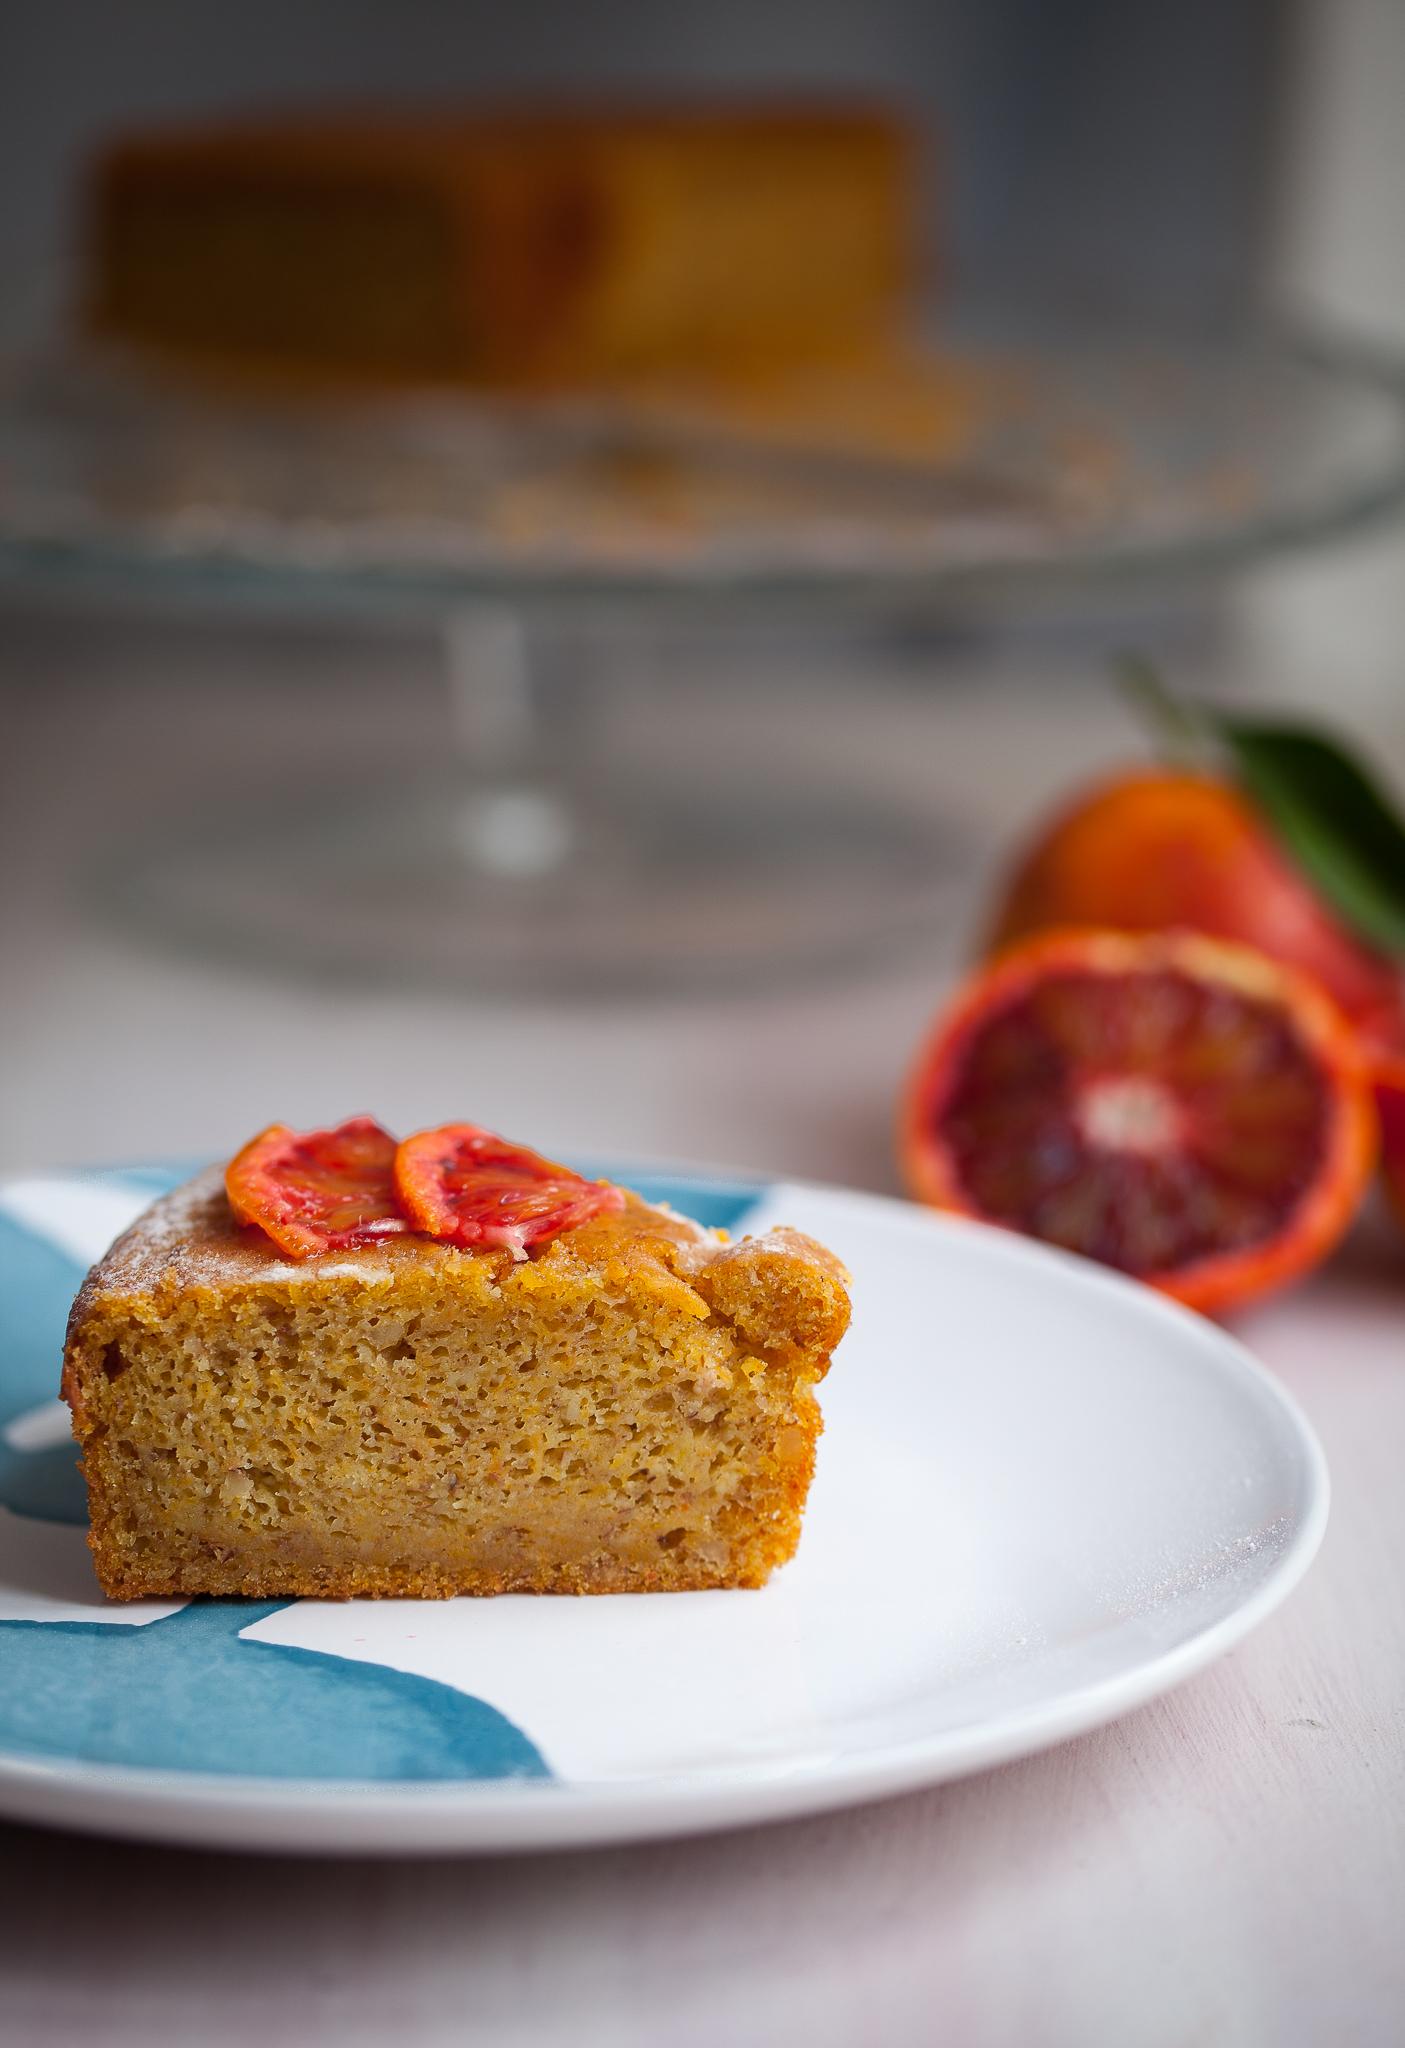 Torta zucca e mandorle al profumo di arance